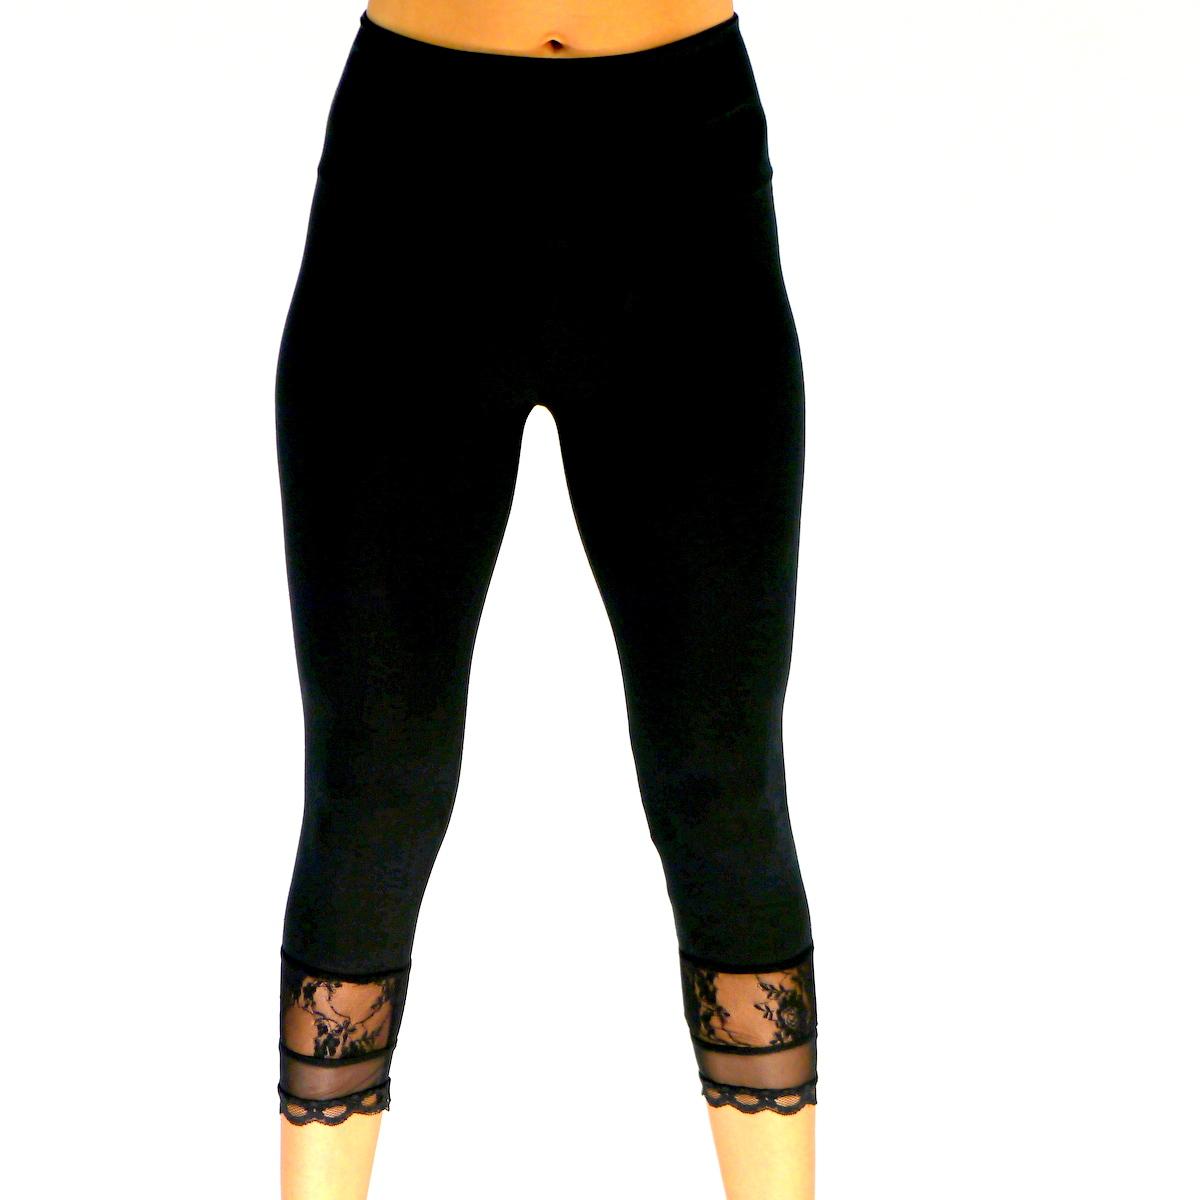 capri leggings adina mit spitze capri leggings. Black Bedroom Furniture Sets. Home Design Ideas